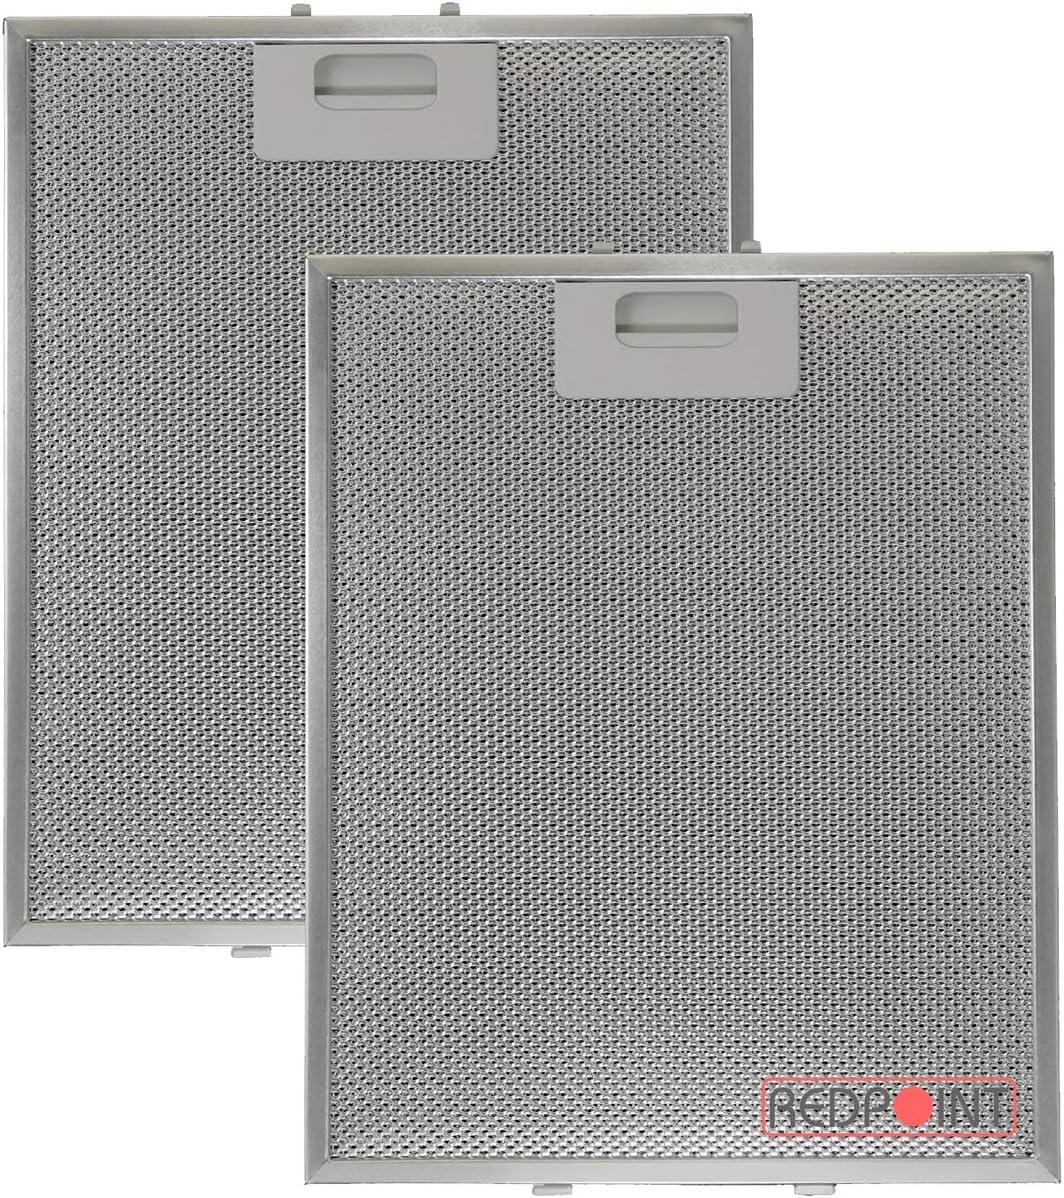 Kit de 2 filtros de aluminio para campana Elica, 260 x 320 x 9 mm, adaptable: A.E.G/NEFF/BAUMATIC/HOTPOINT/INDESIT/ELICA/TEKA